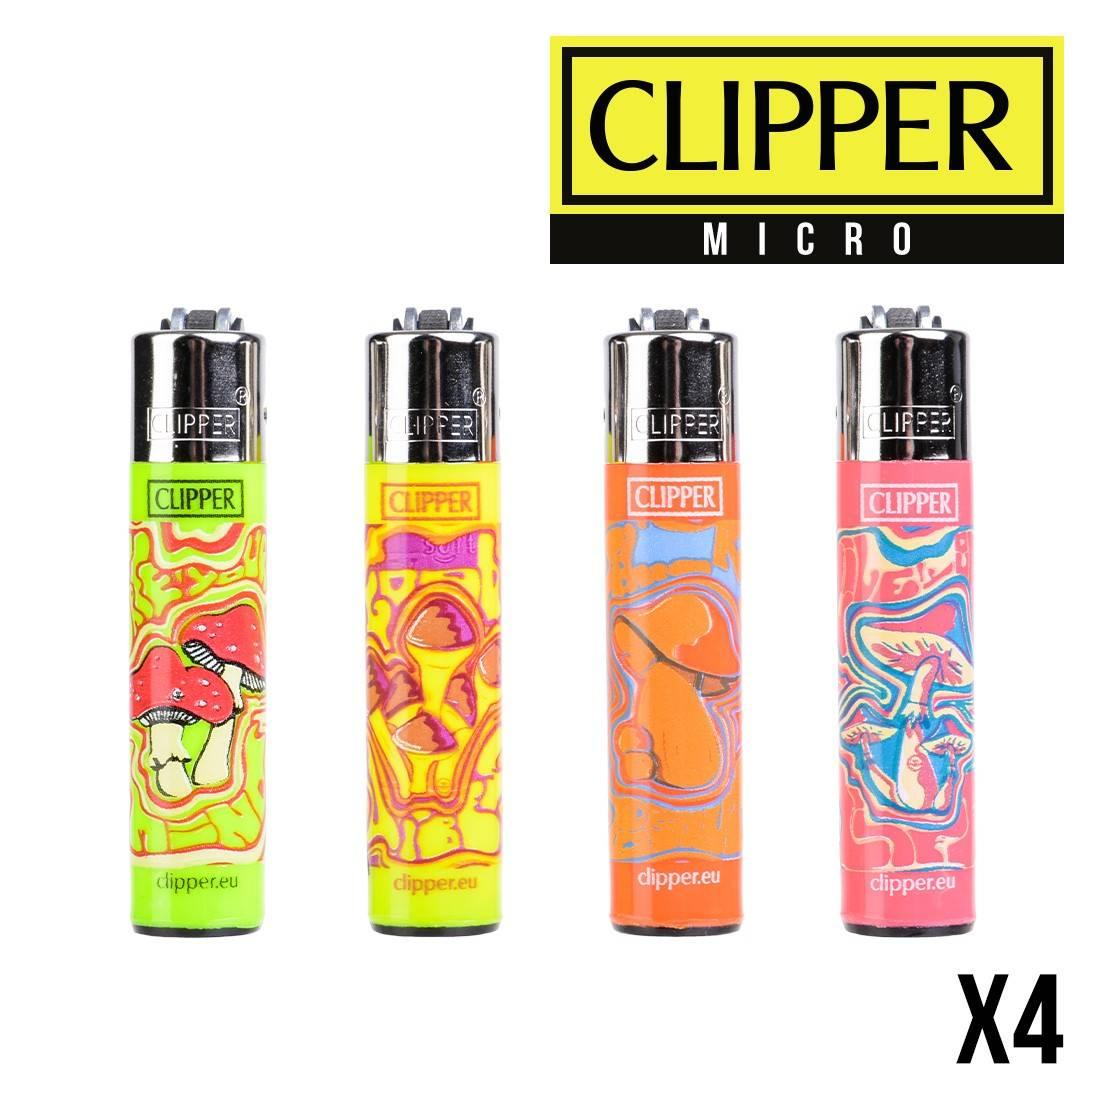 MICRO CLIPPER MUSH X4